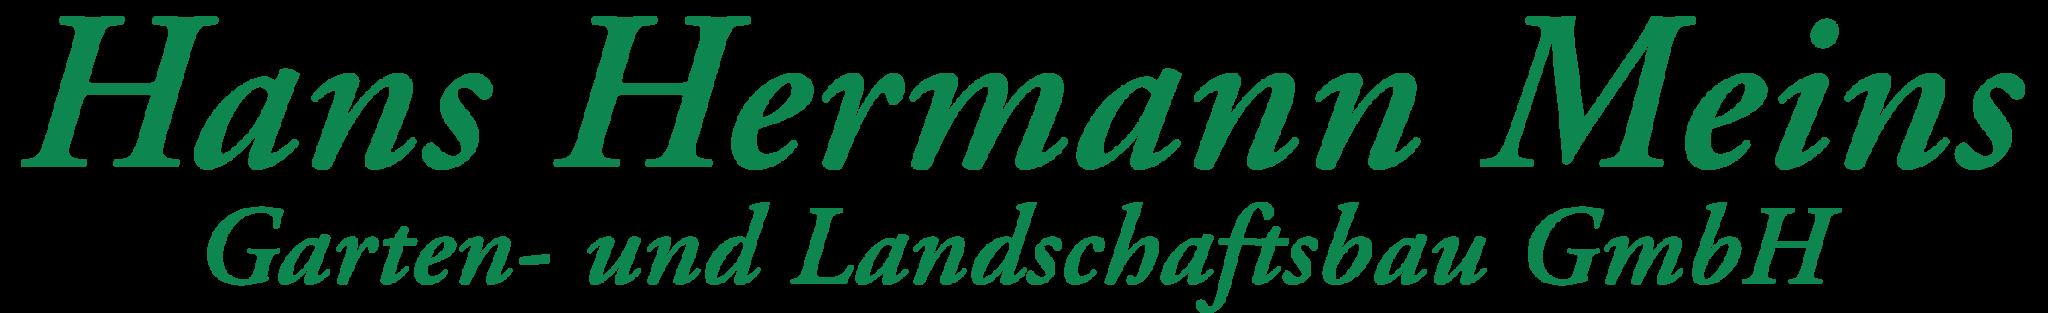 Logo f Web HansHermannMeins 150dpi 2048x313 1